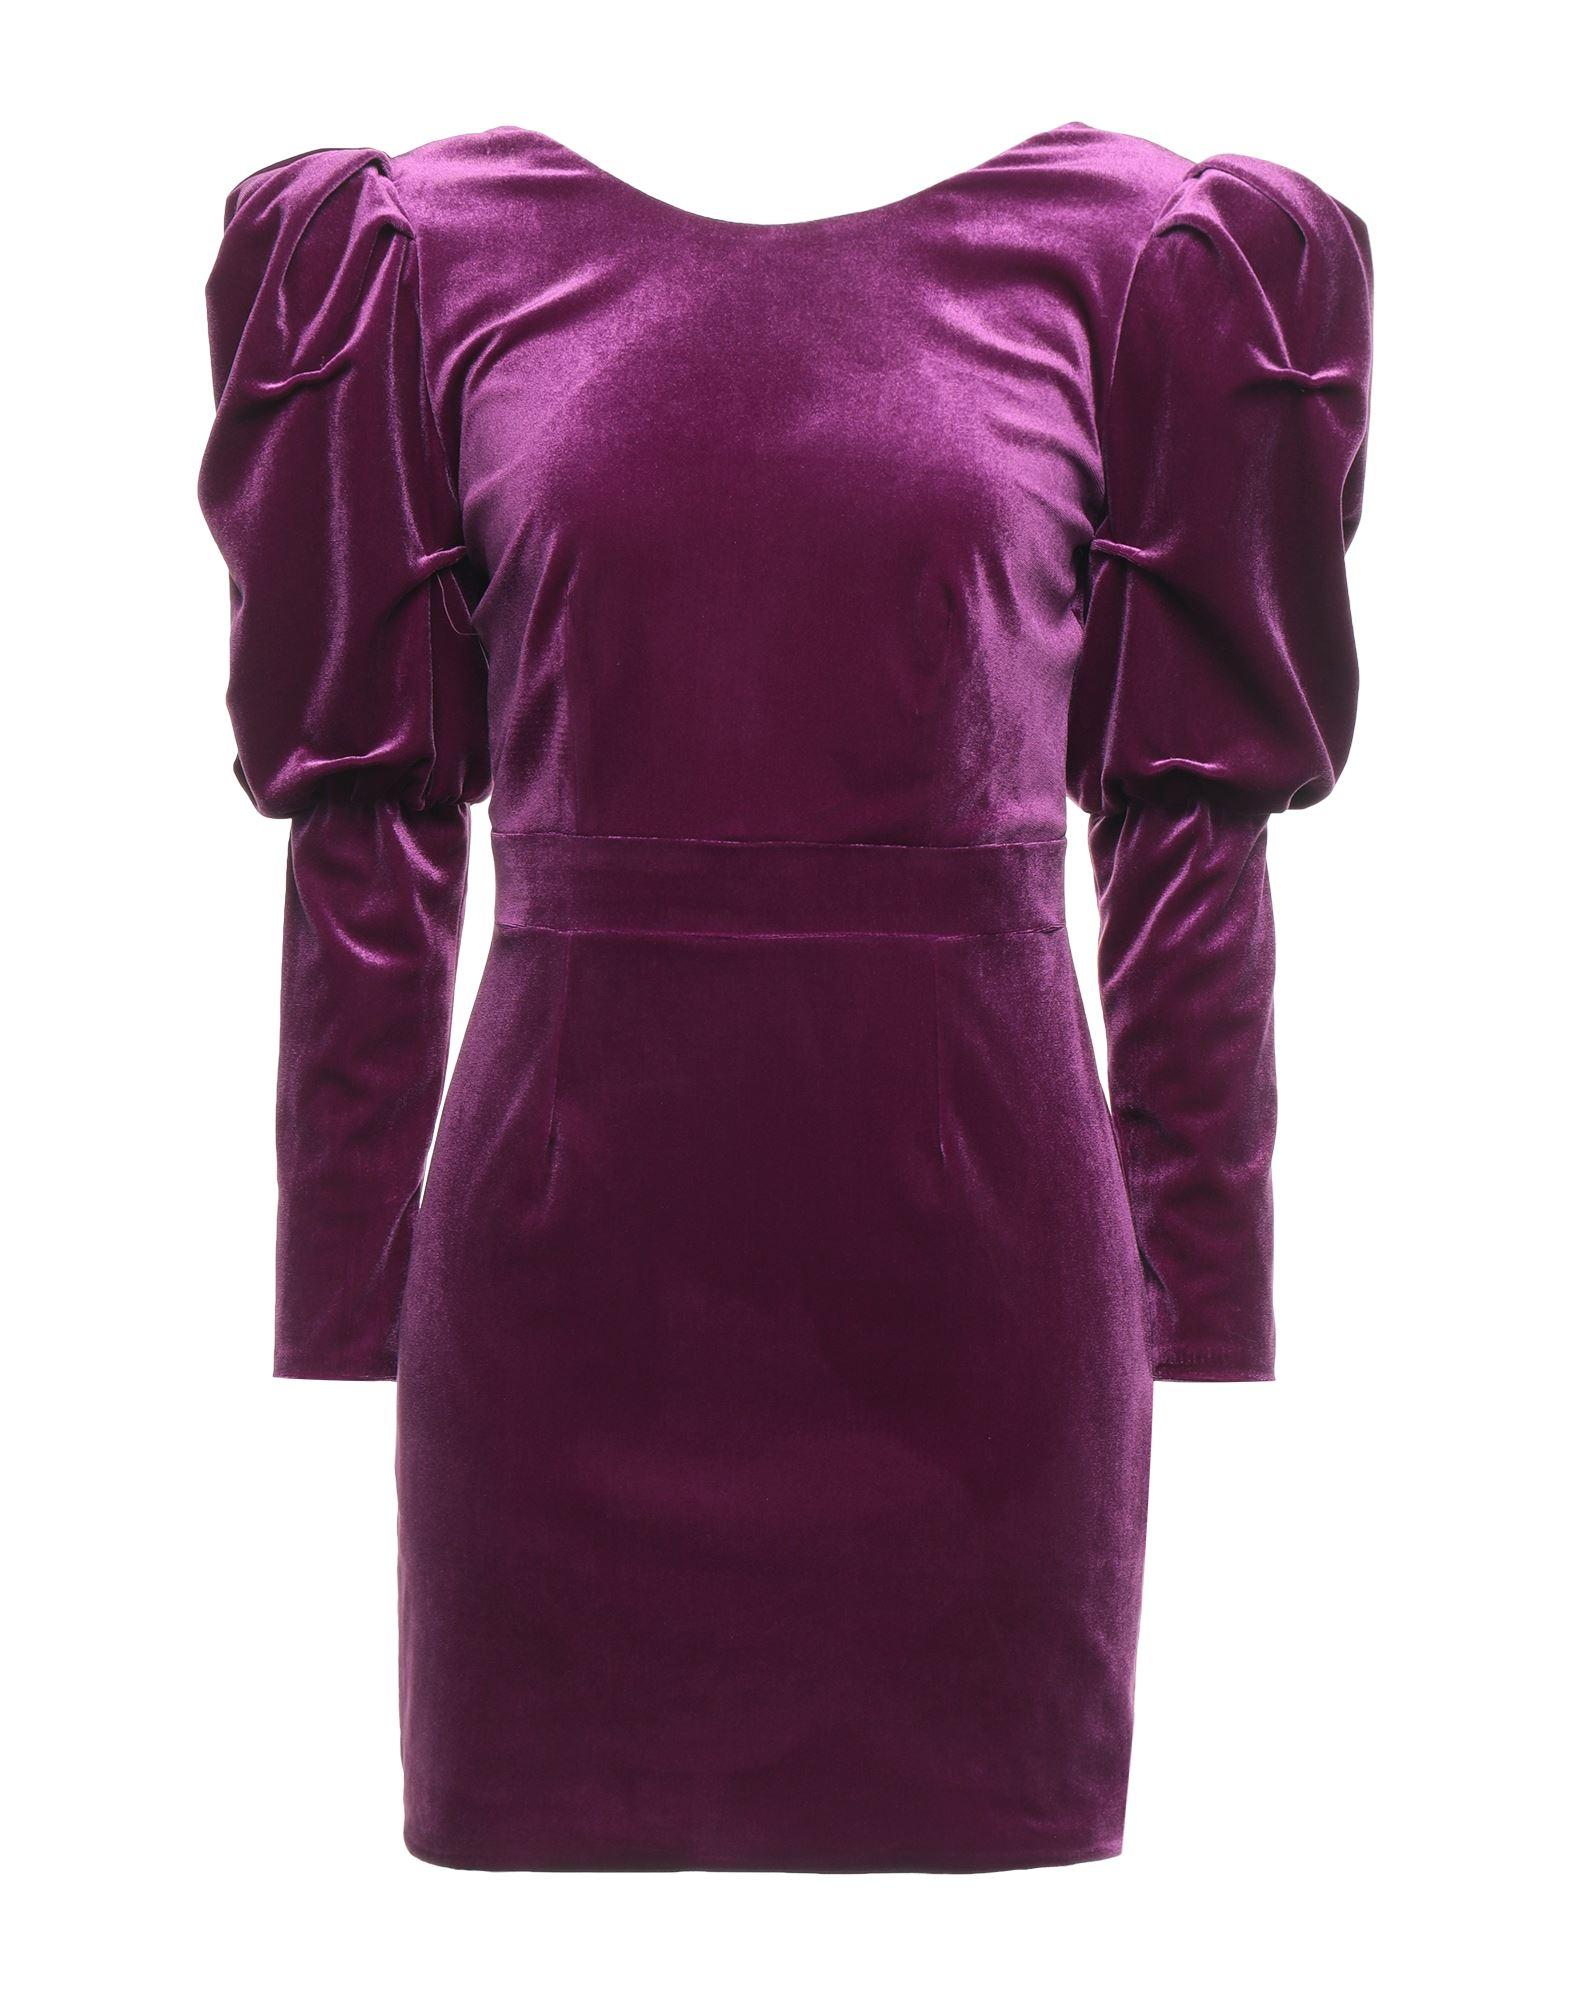 Actualee Short Dresses In Mauve